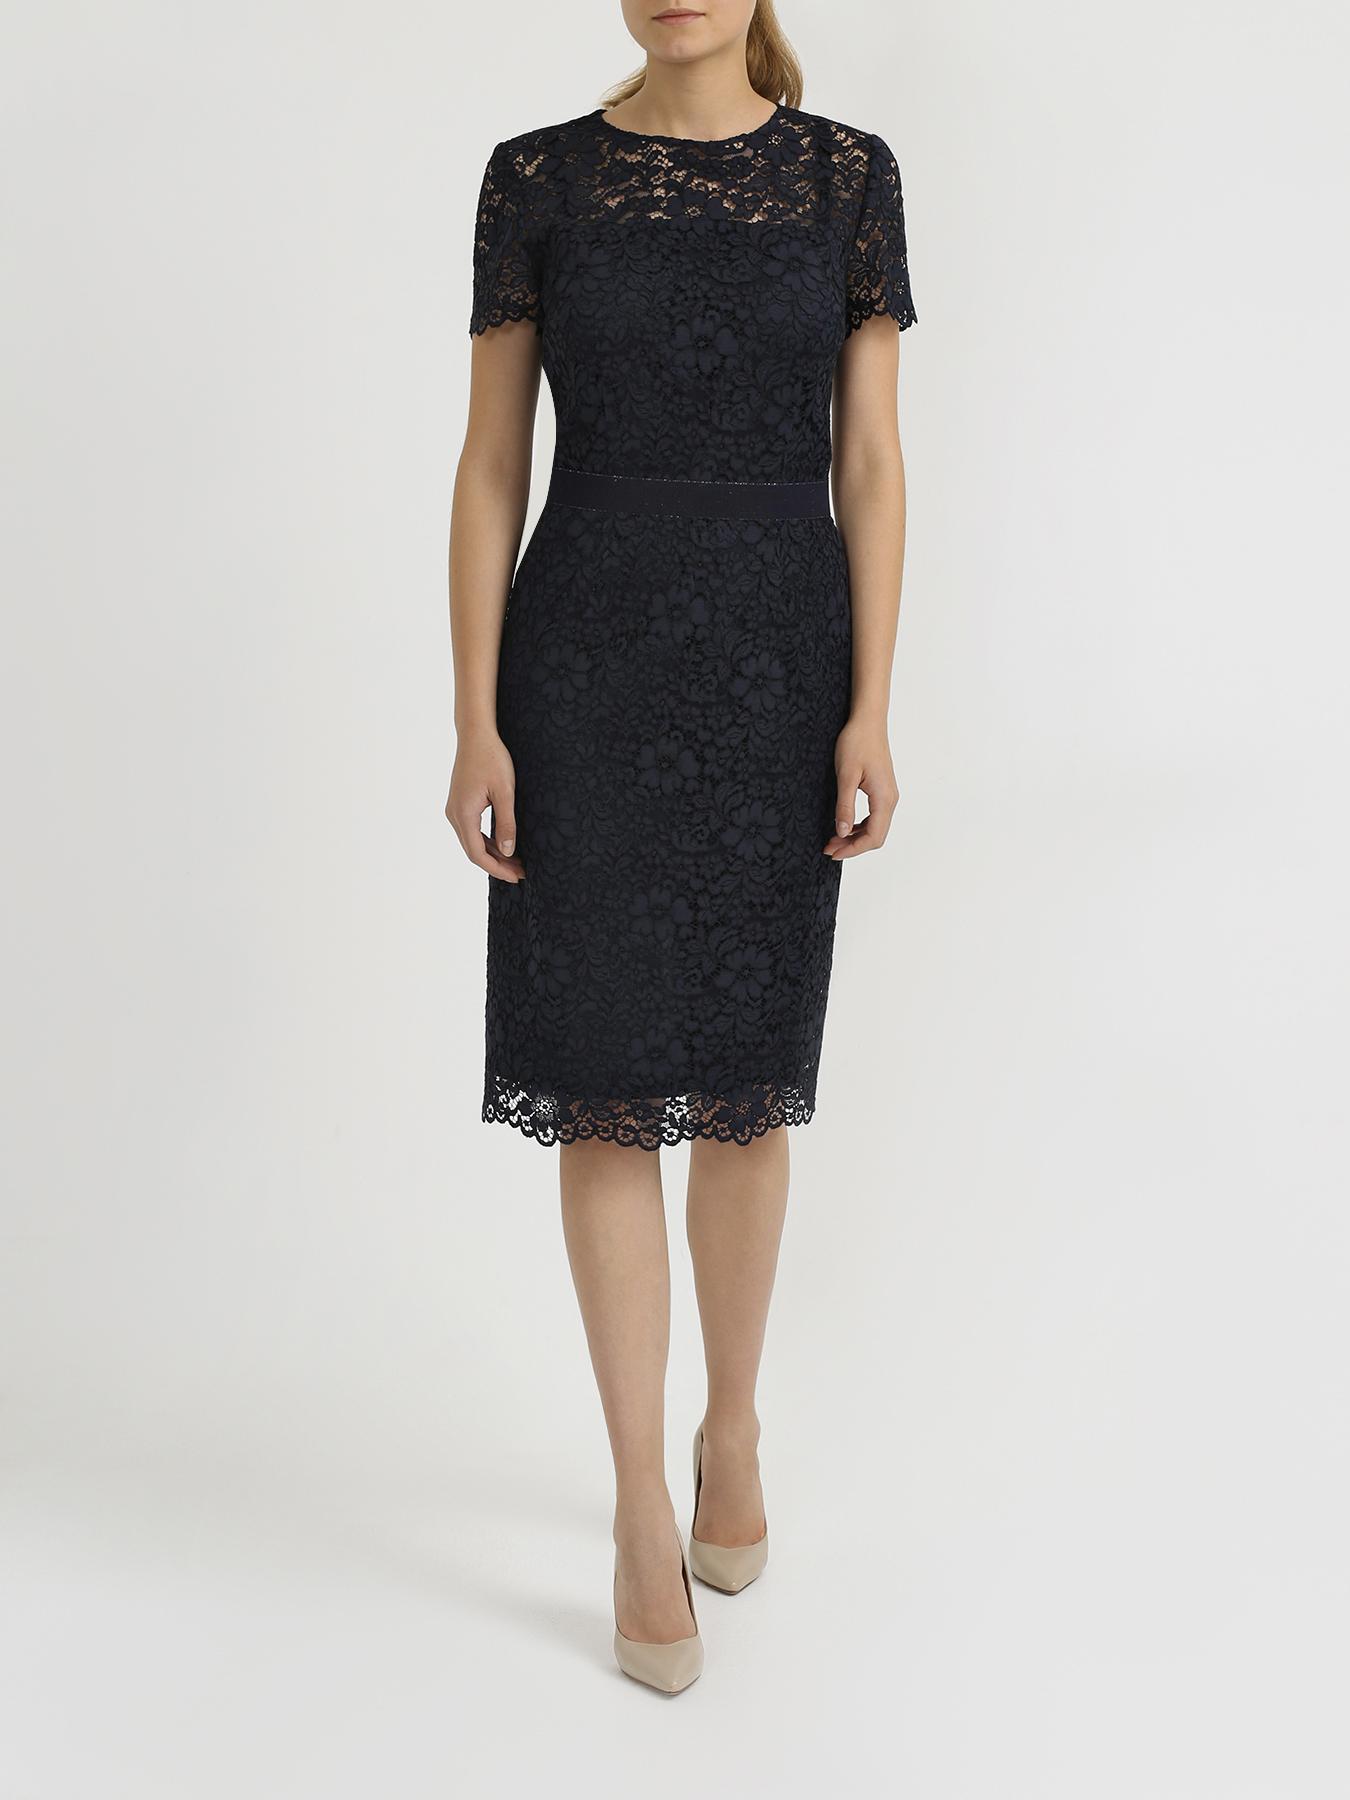 Платье Korpo Кружевное платье